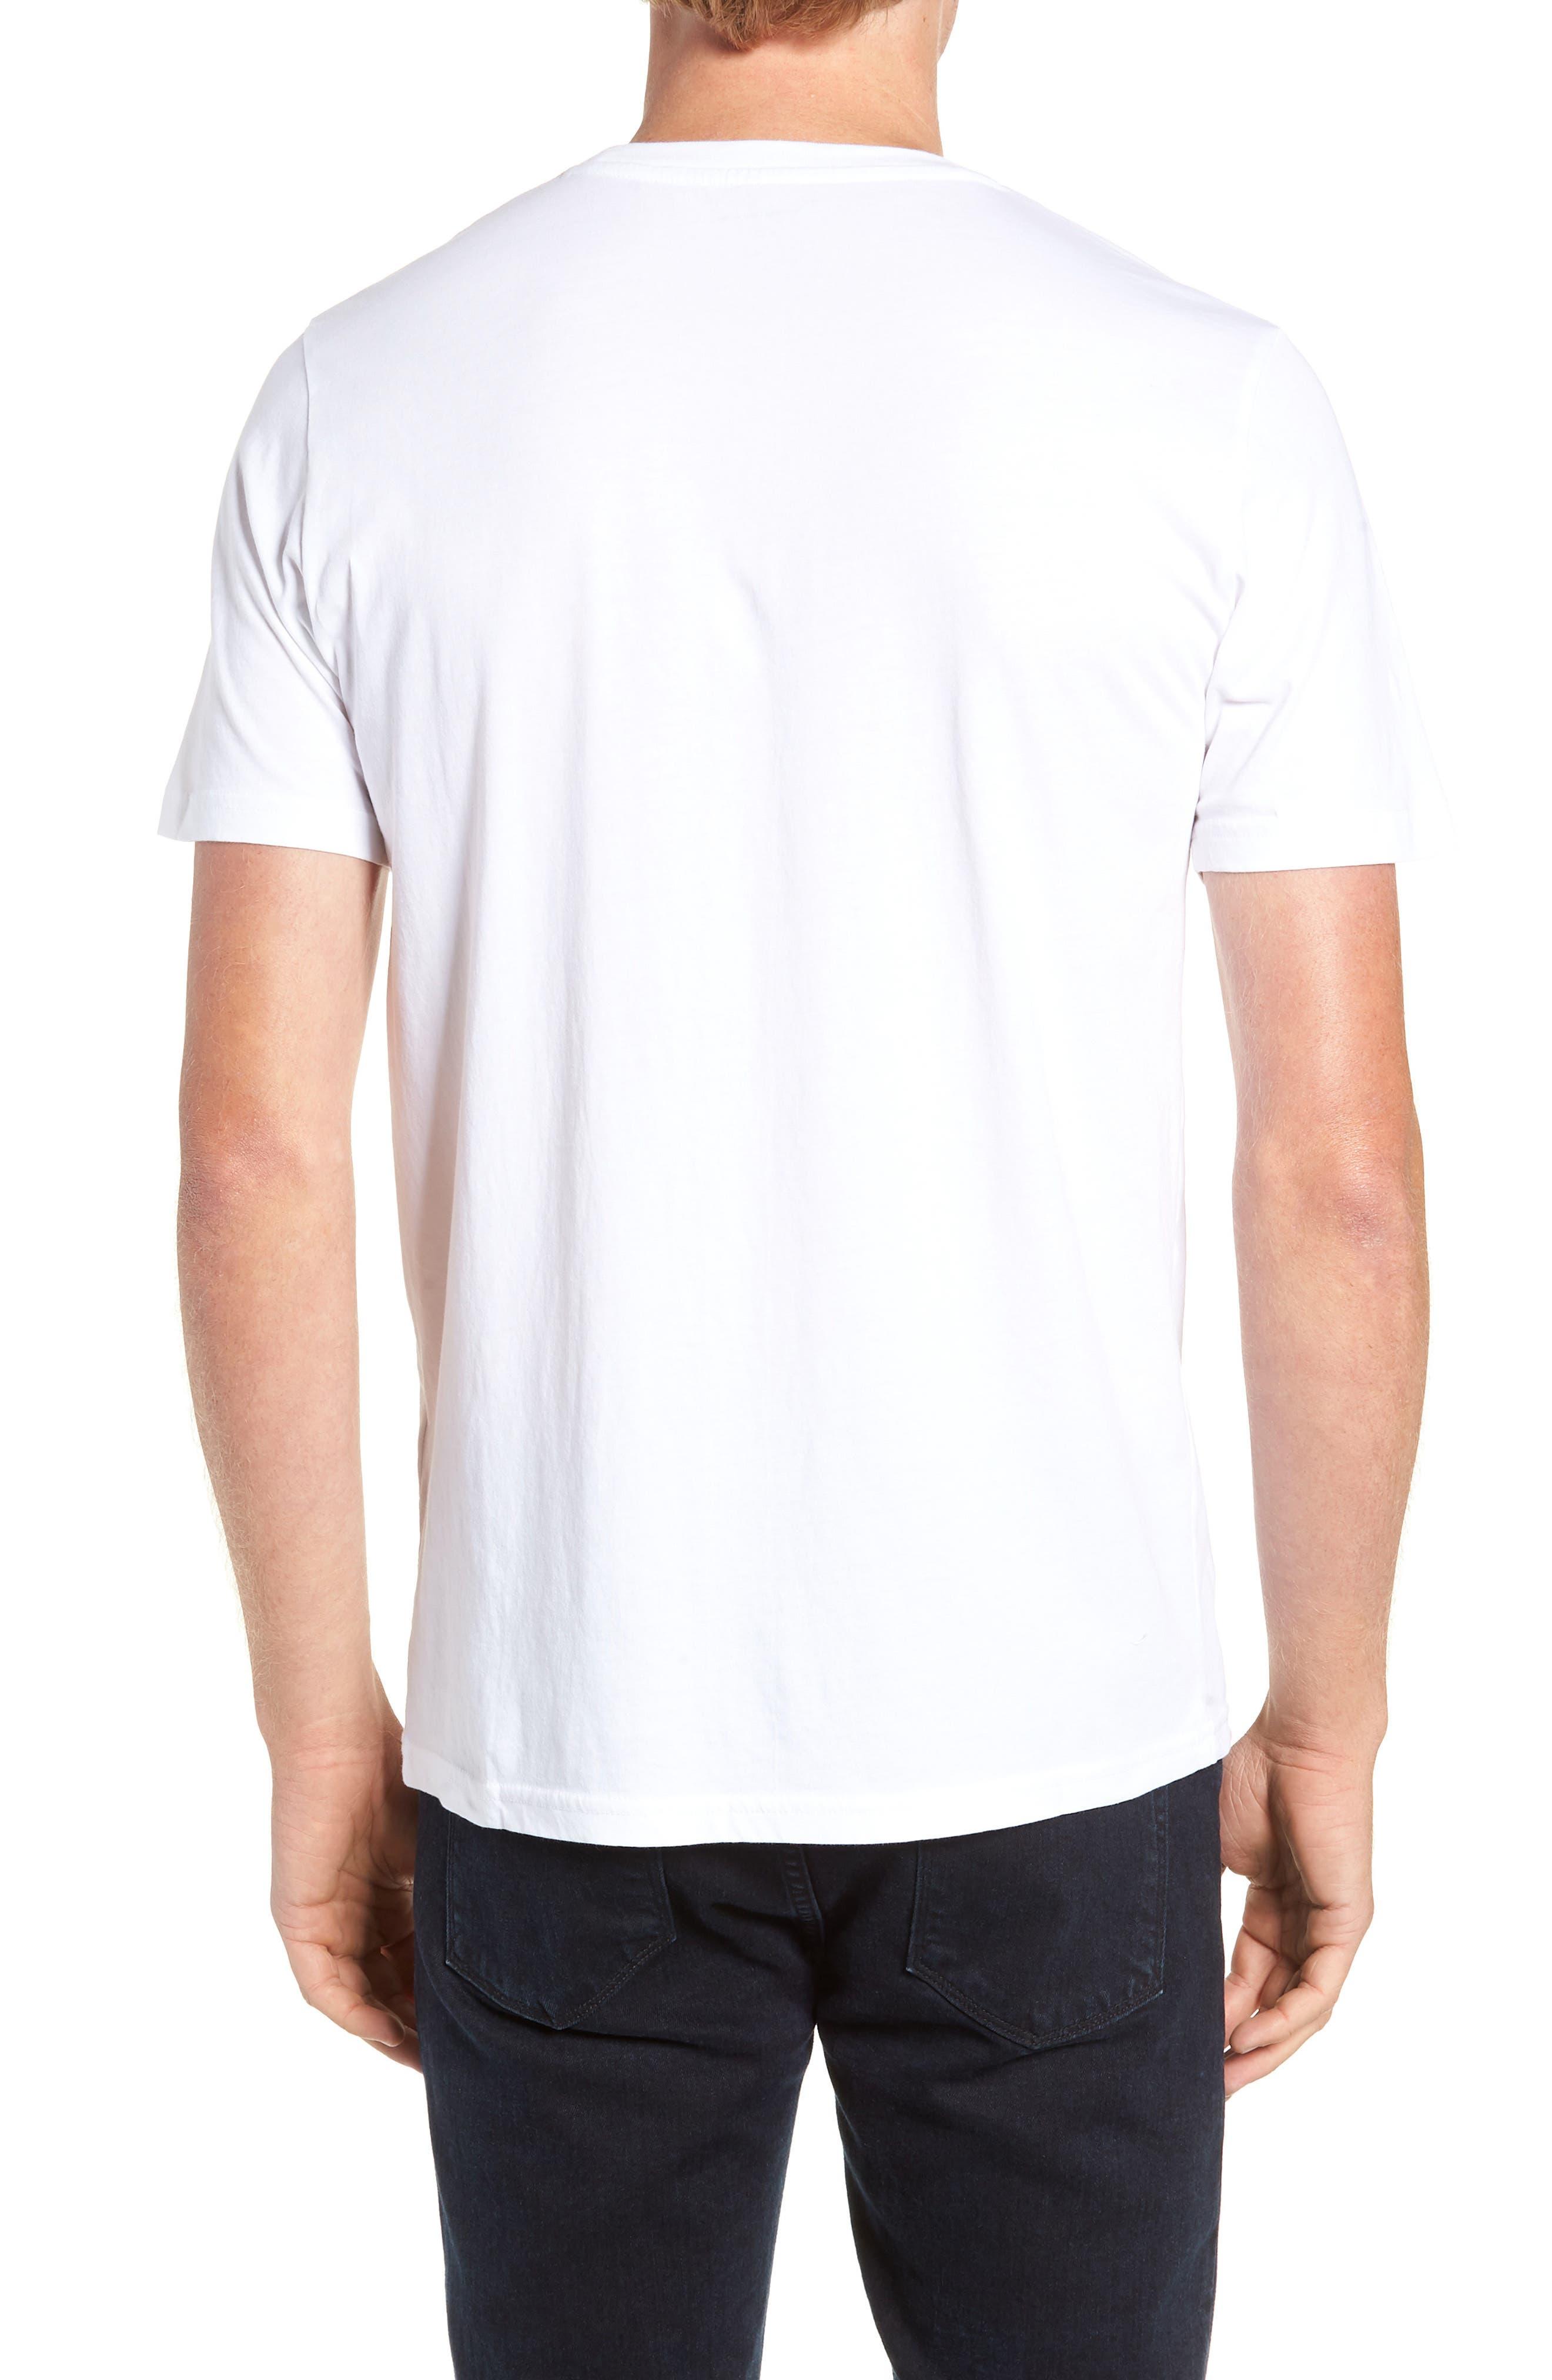 Owl Concept T-Shirt,                             Alternate thumbnail 2, color,                             WHITE